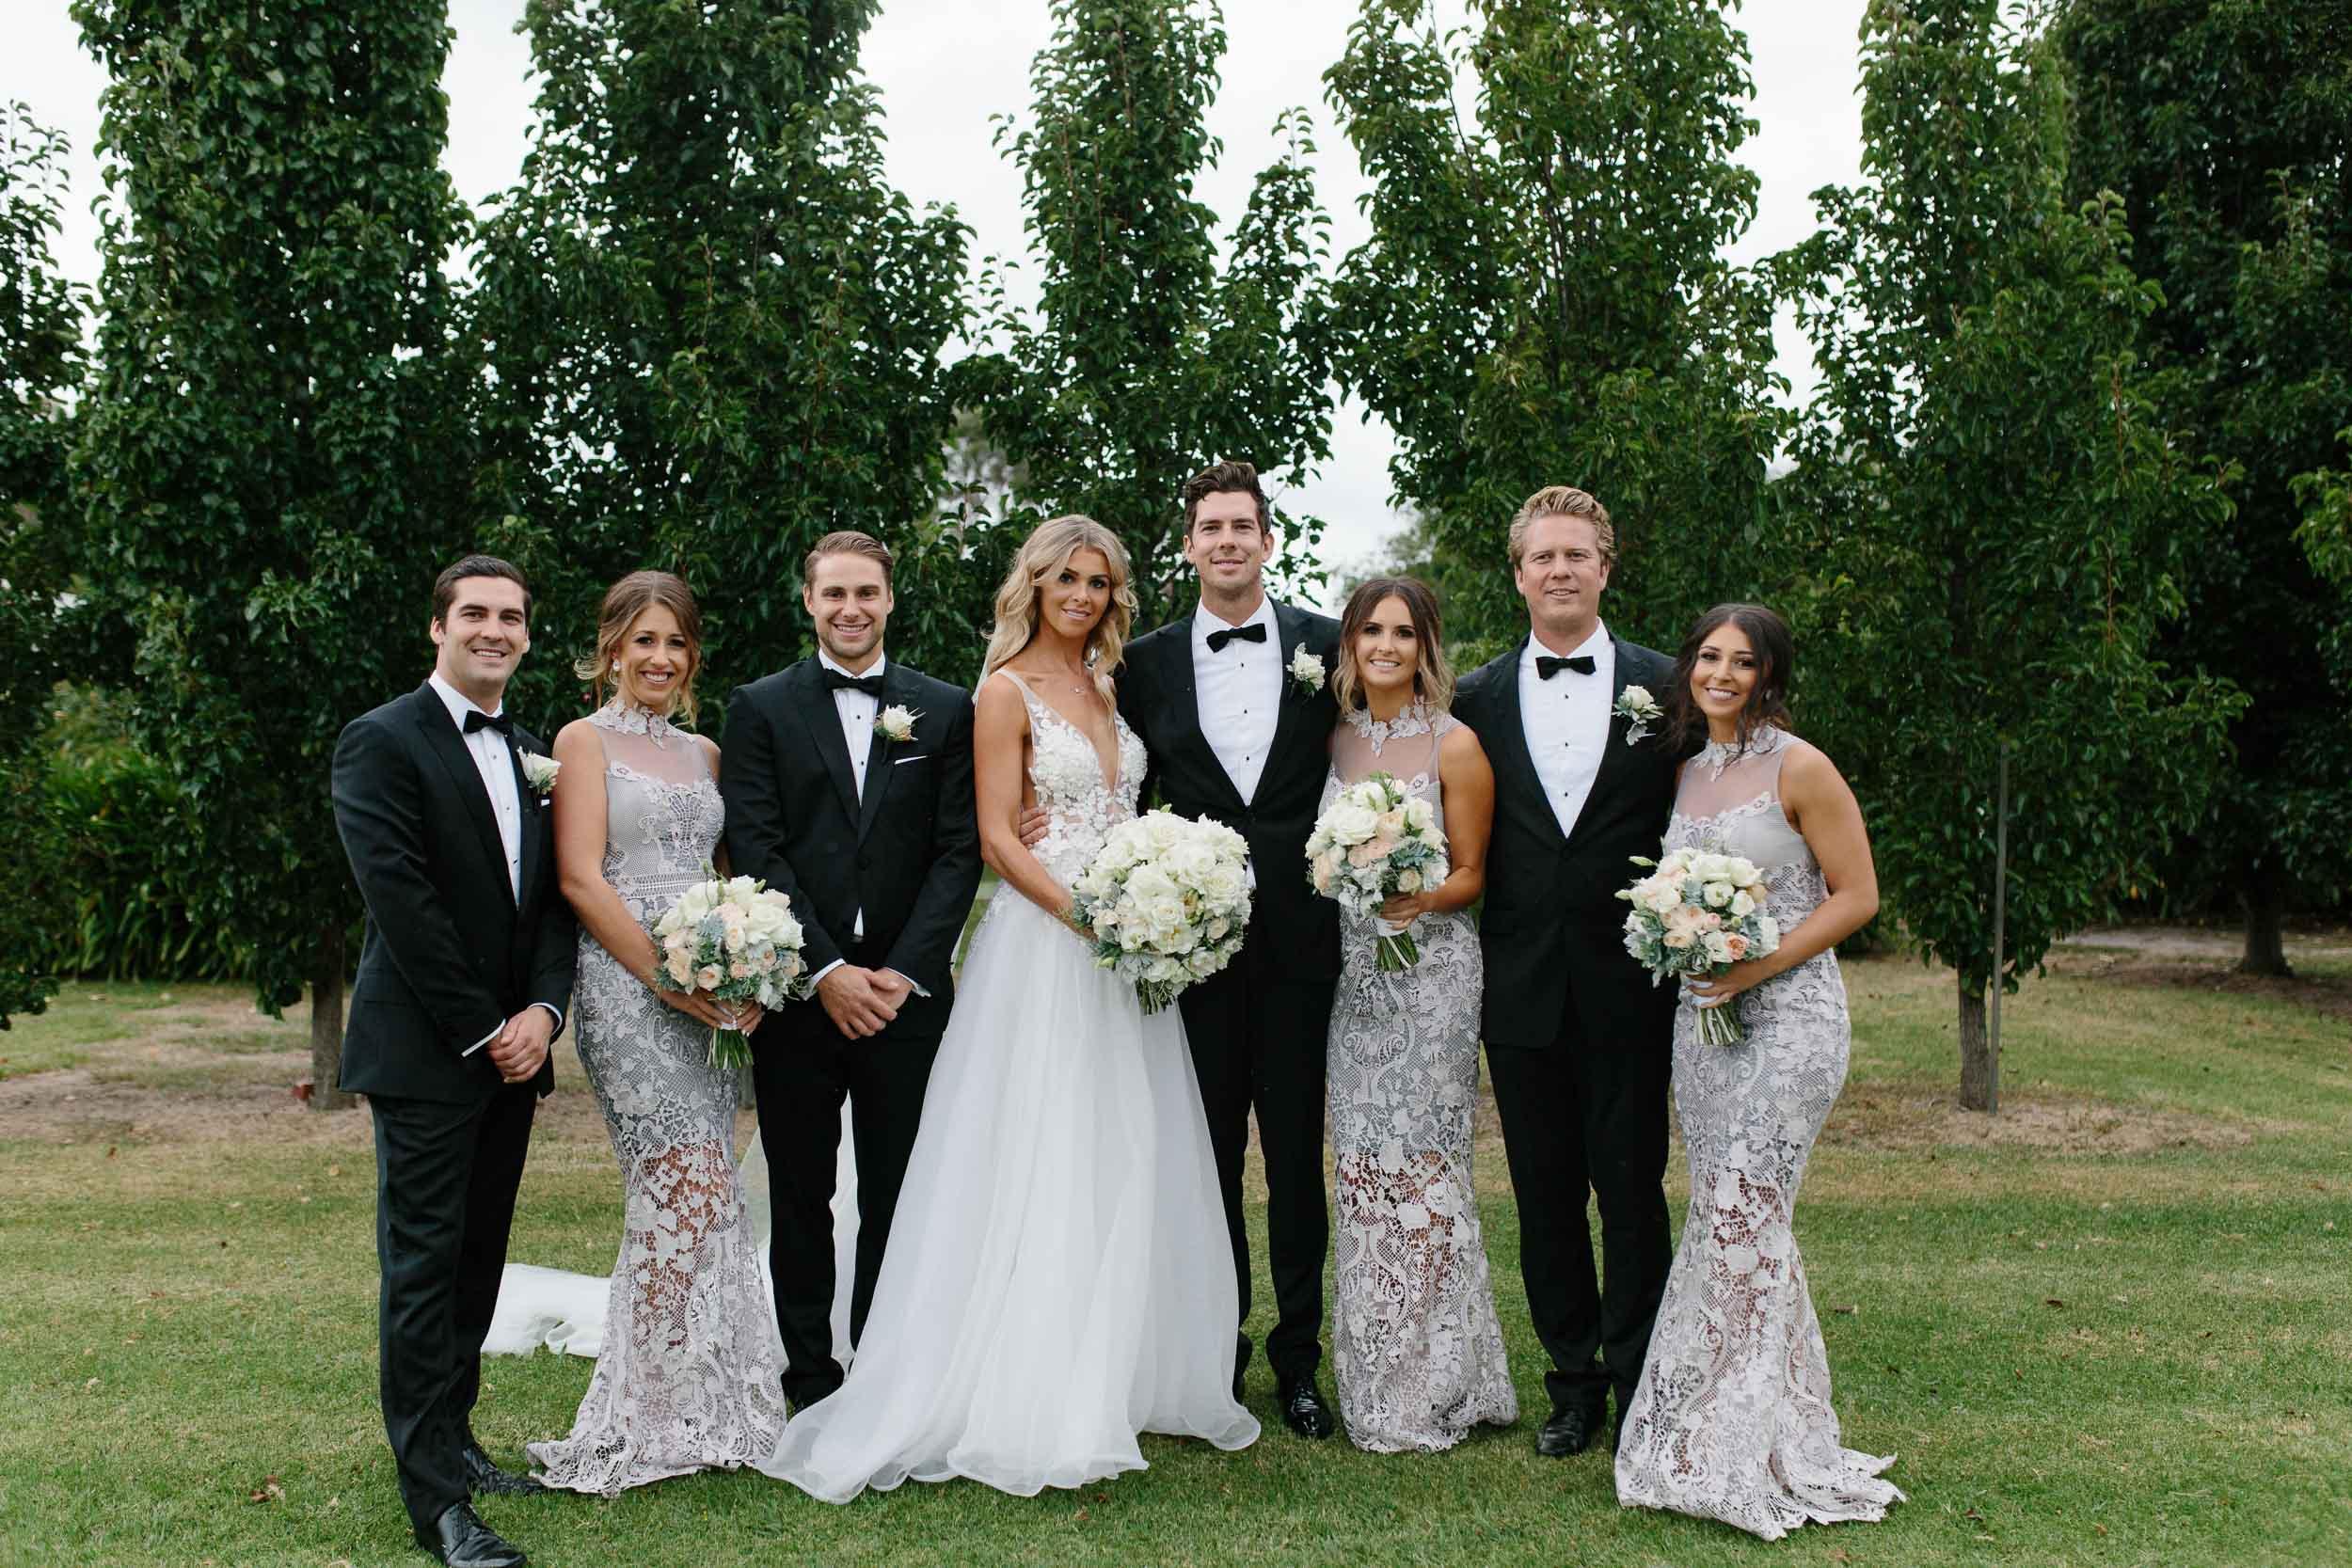 Kas-Richards-Mornington-Peninsula-Private-Property-Wedding-Marianna-Hardwick-Gown-390.jpg